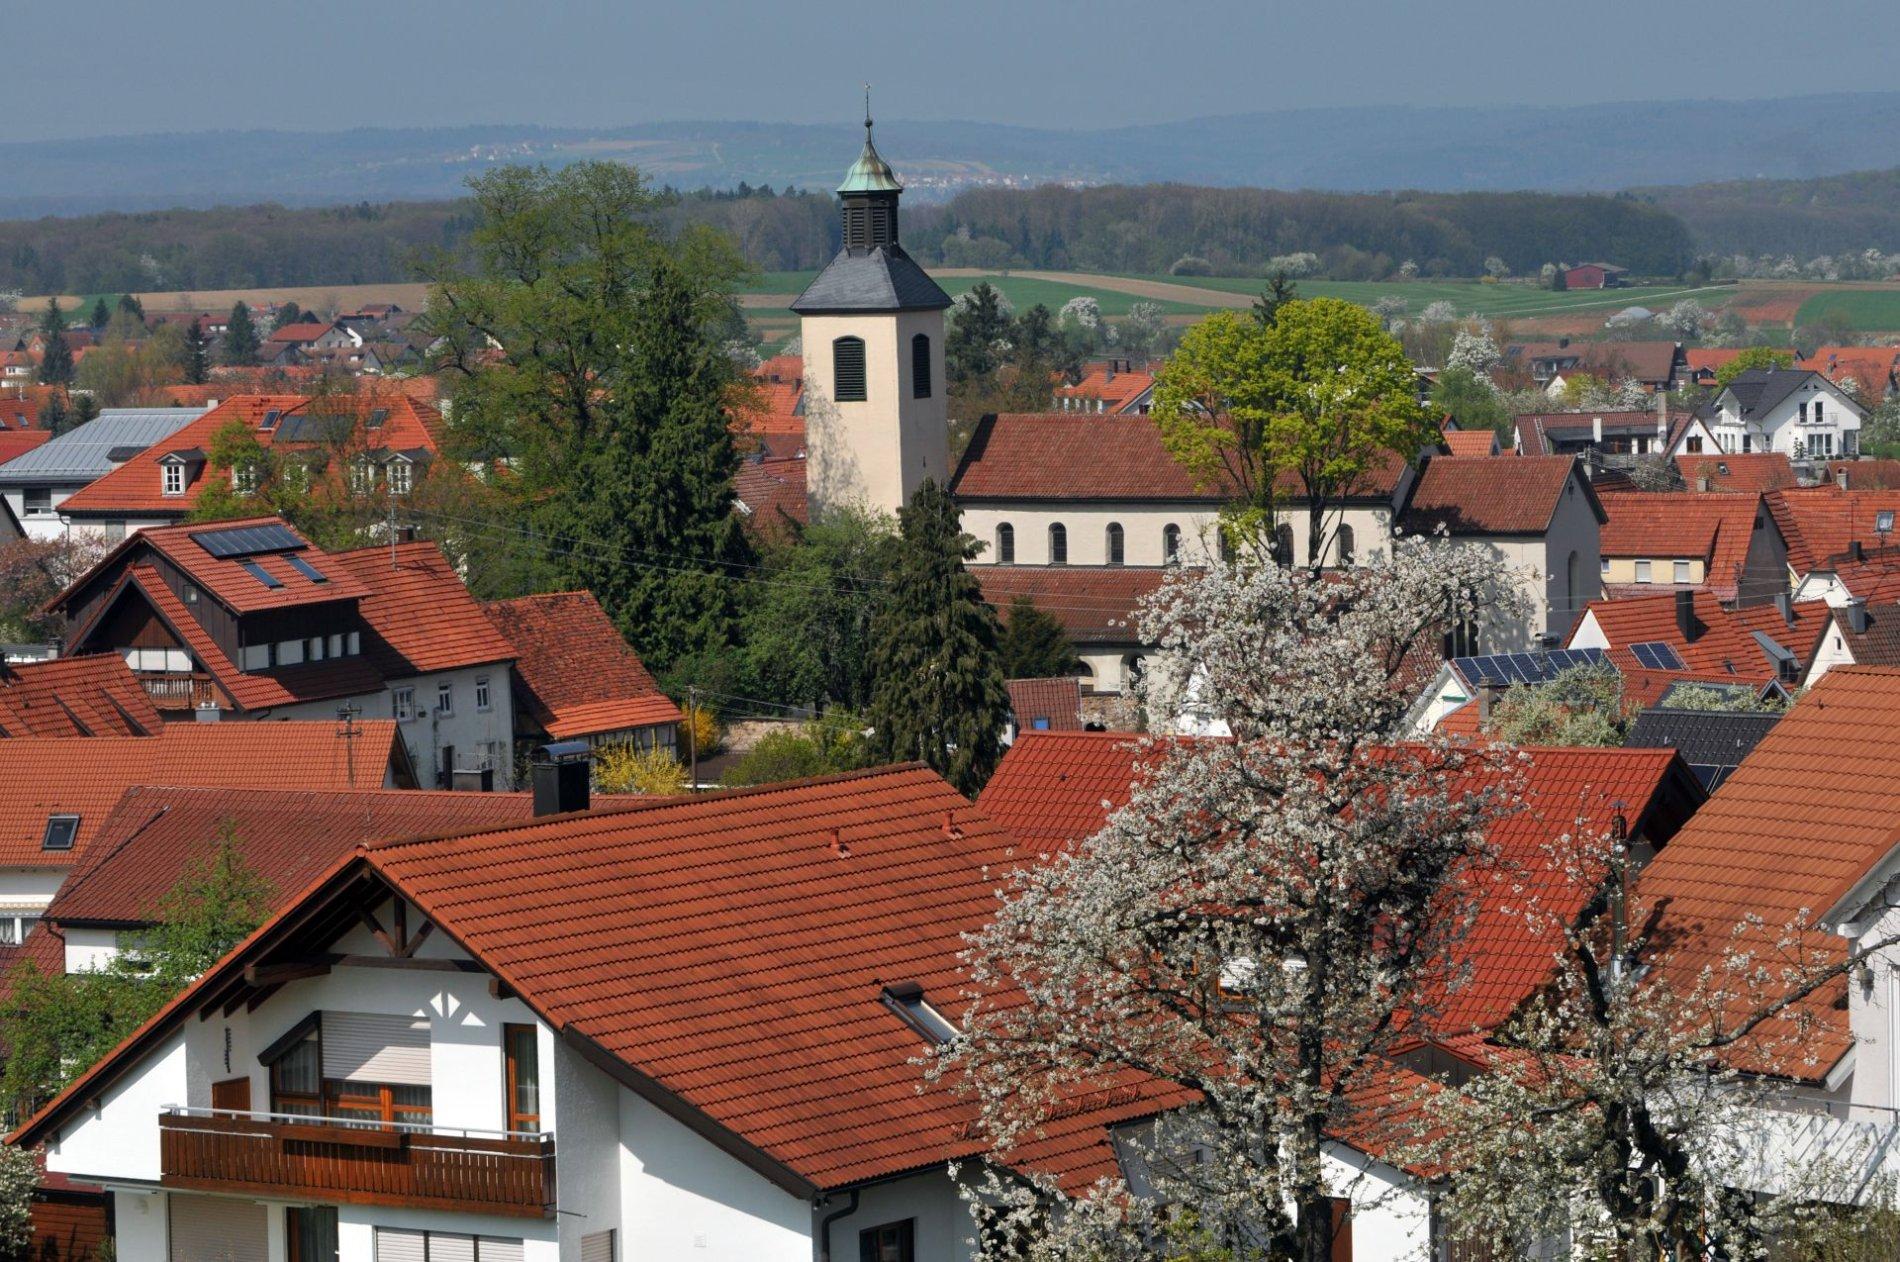 Blick auf Bad Boll mit Kirche